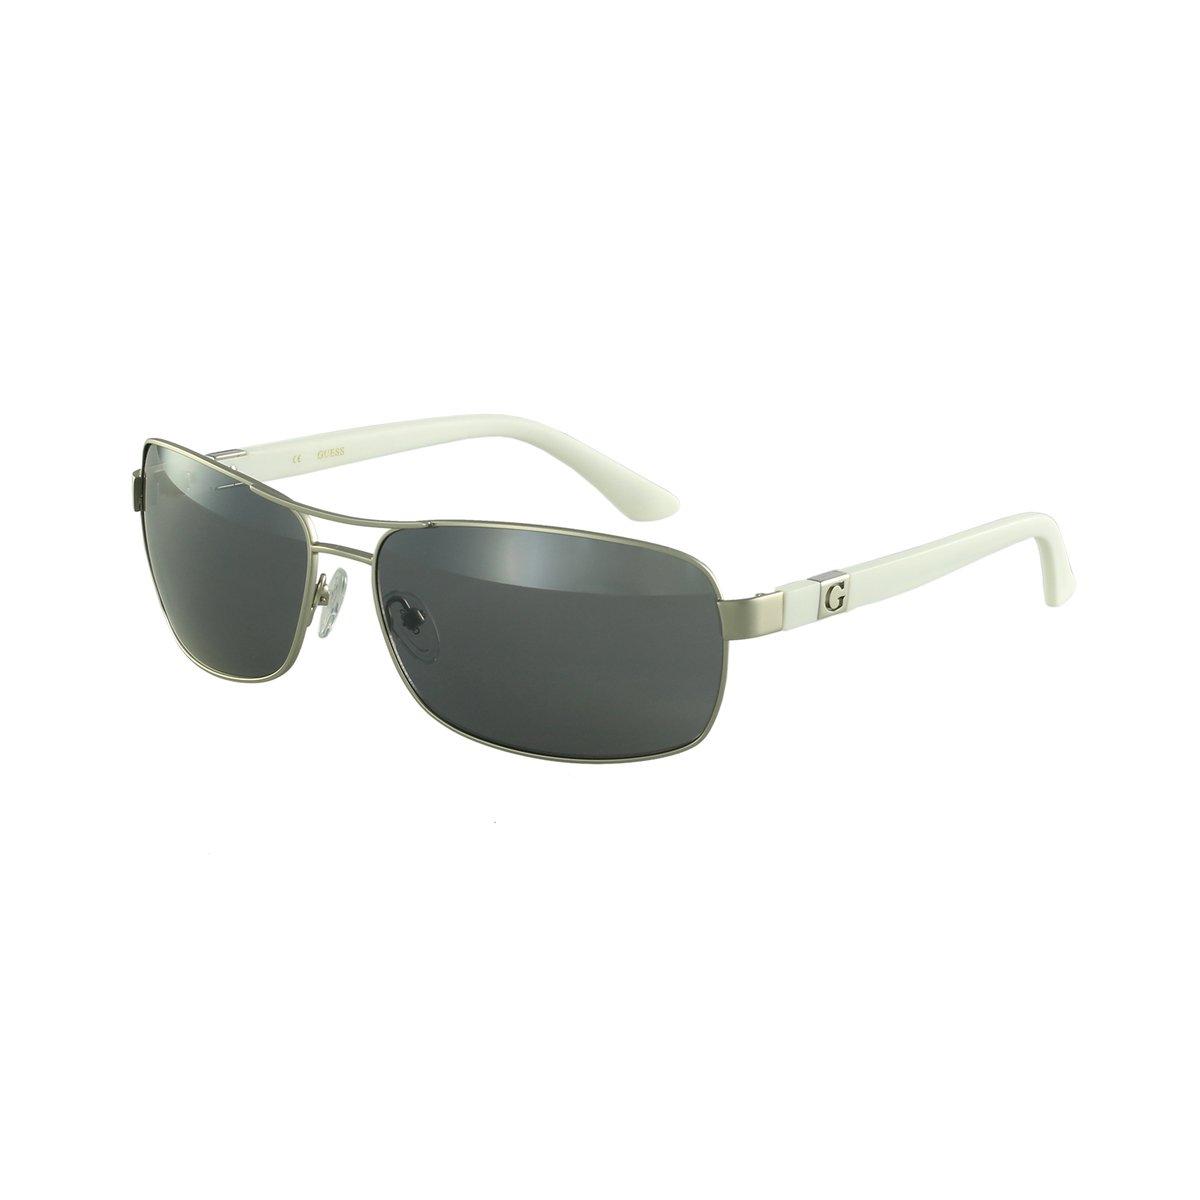 Óculos De Sol Guess Esportivo - Compre Agora   Zattini 477f8279ae